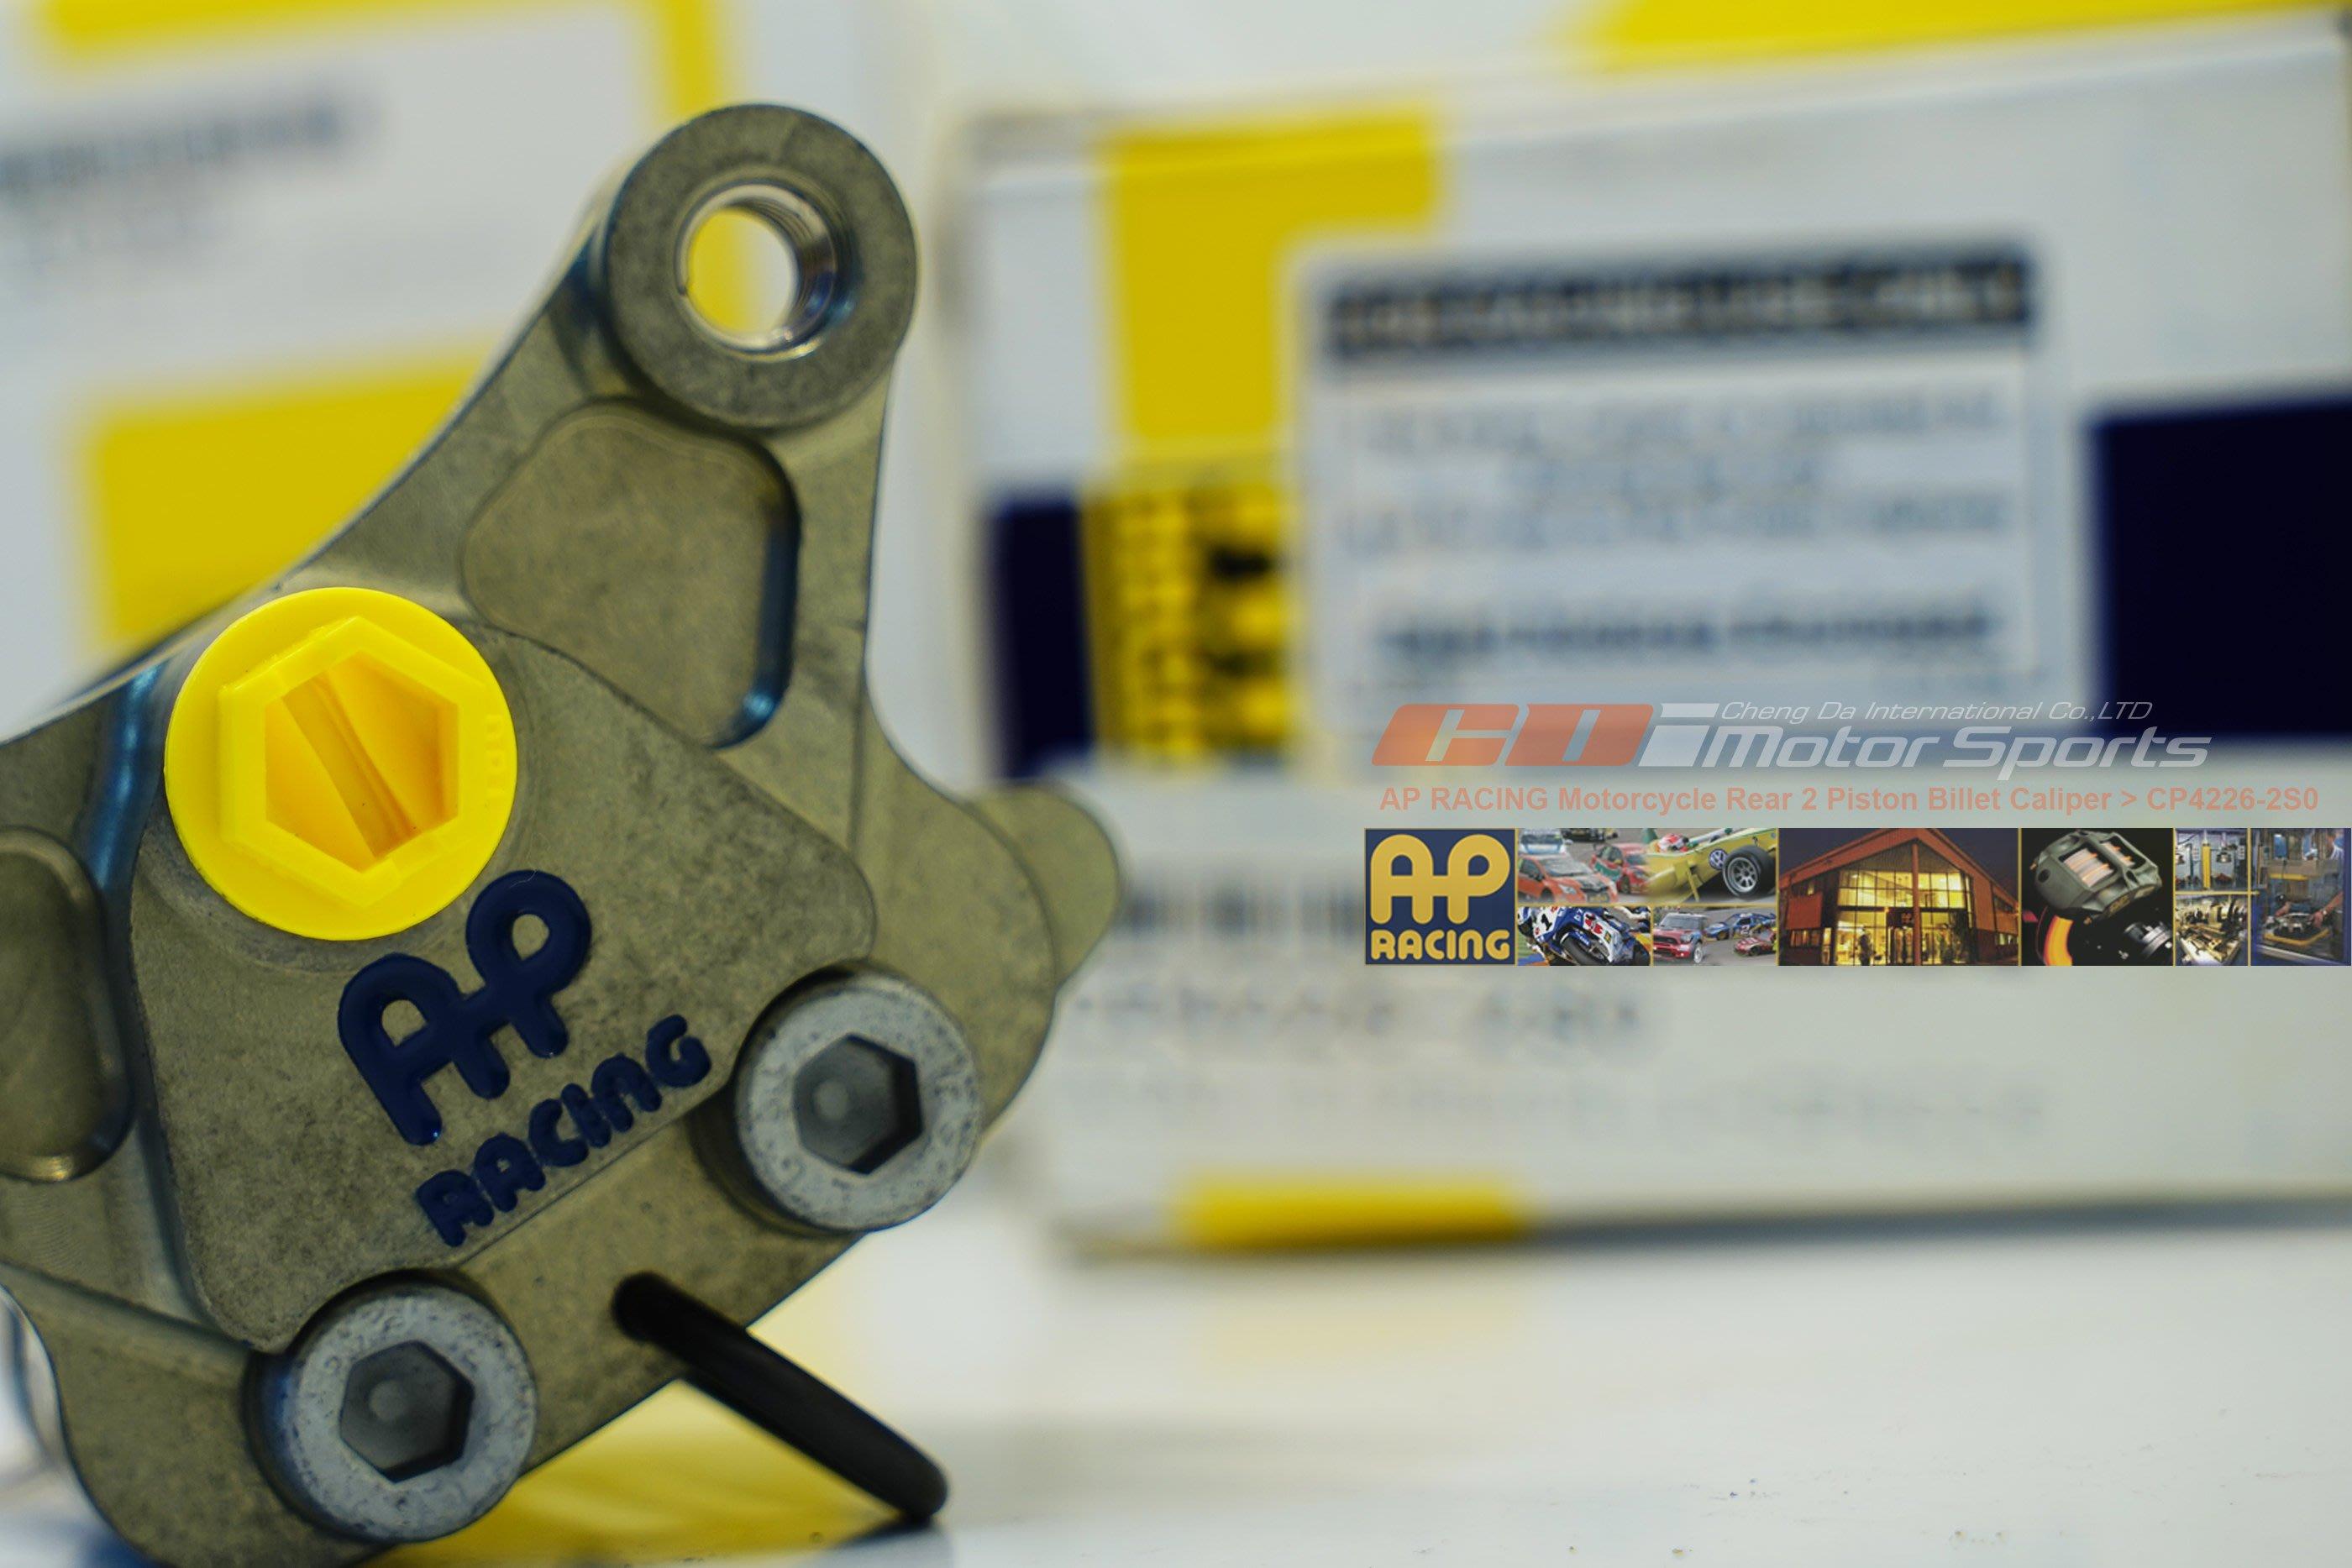 AP RACING CP-4226-2S0 對二活塞卡鉗活塞:25 4×2 小螃蟹原裝卡鉗